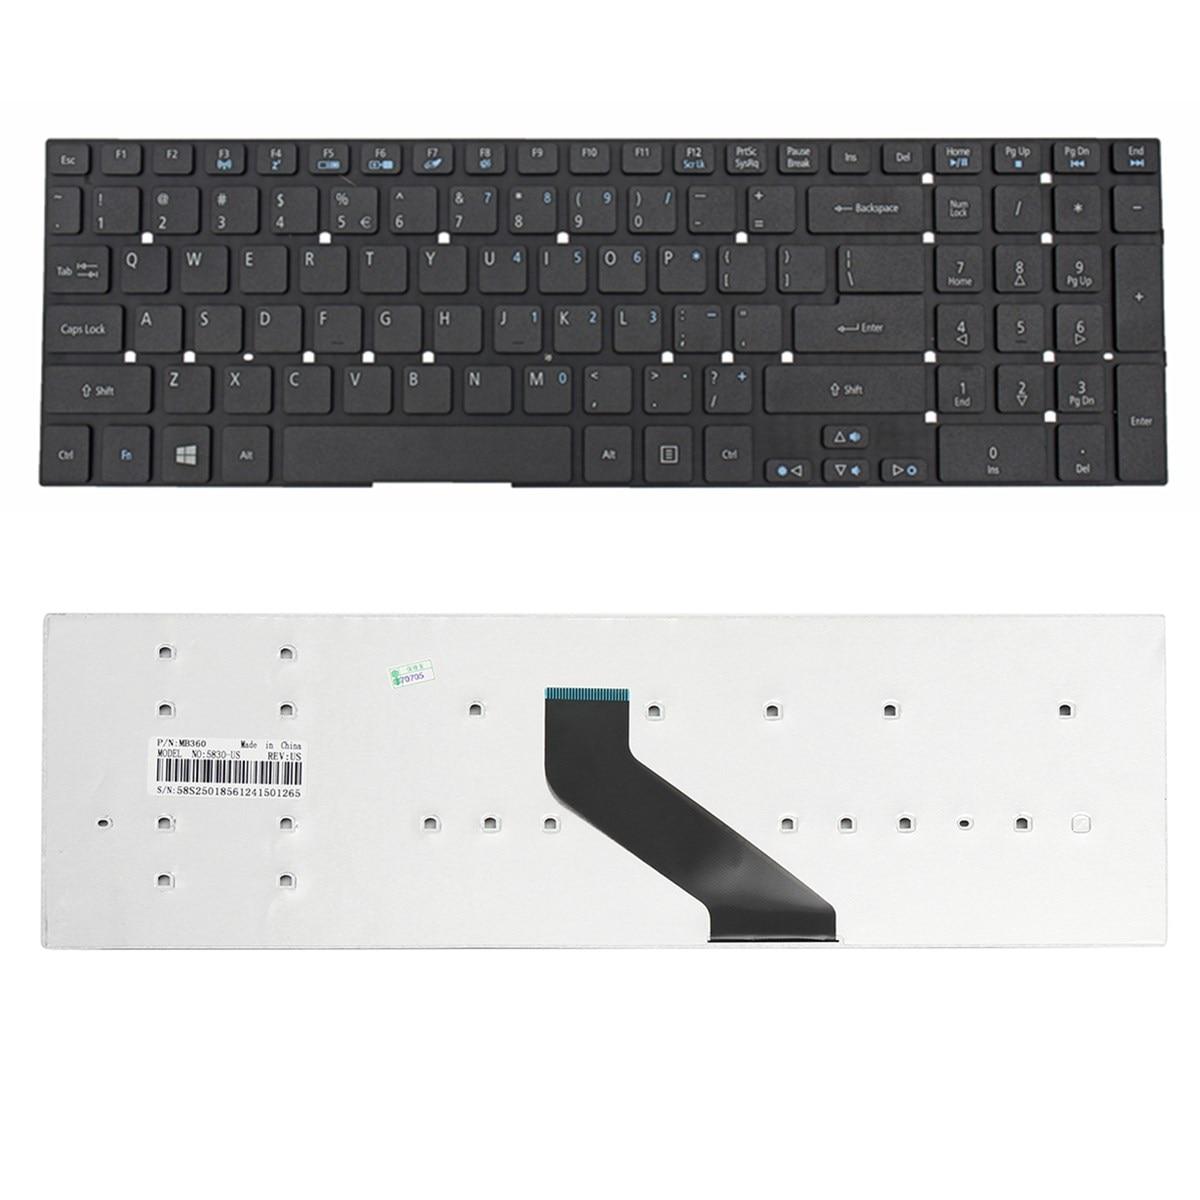 Black Key Board US English Laptop Keyboard For Acer Aspire E5-511,E5-511G,E5-571,E5-571G Series